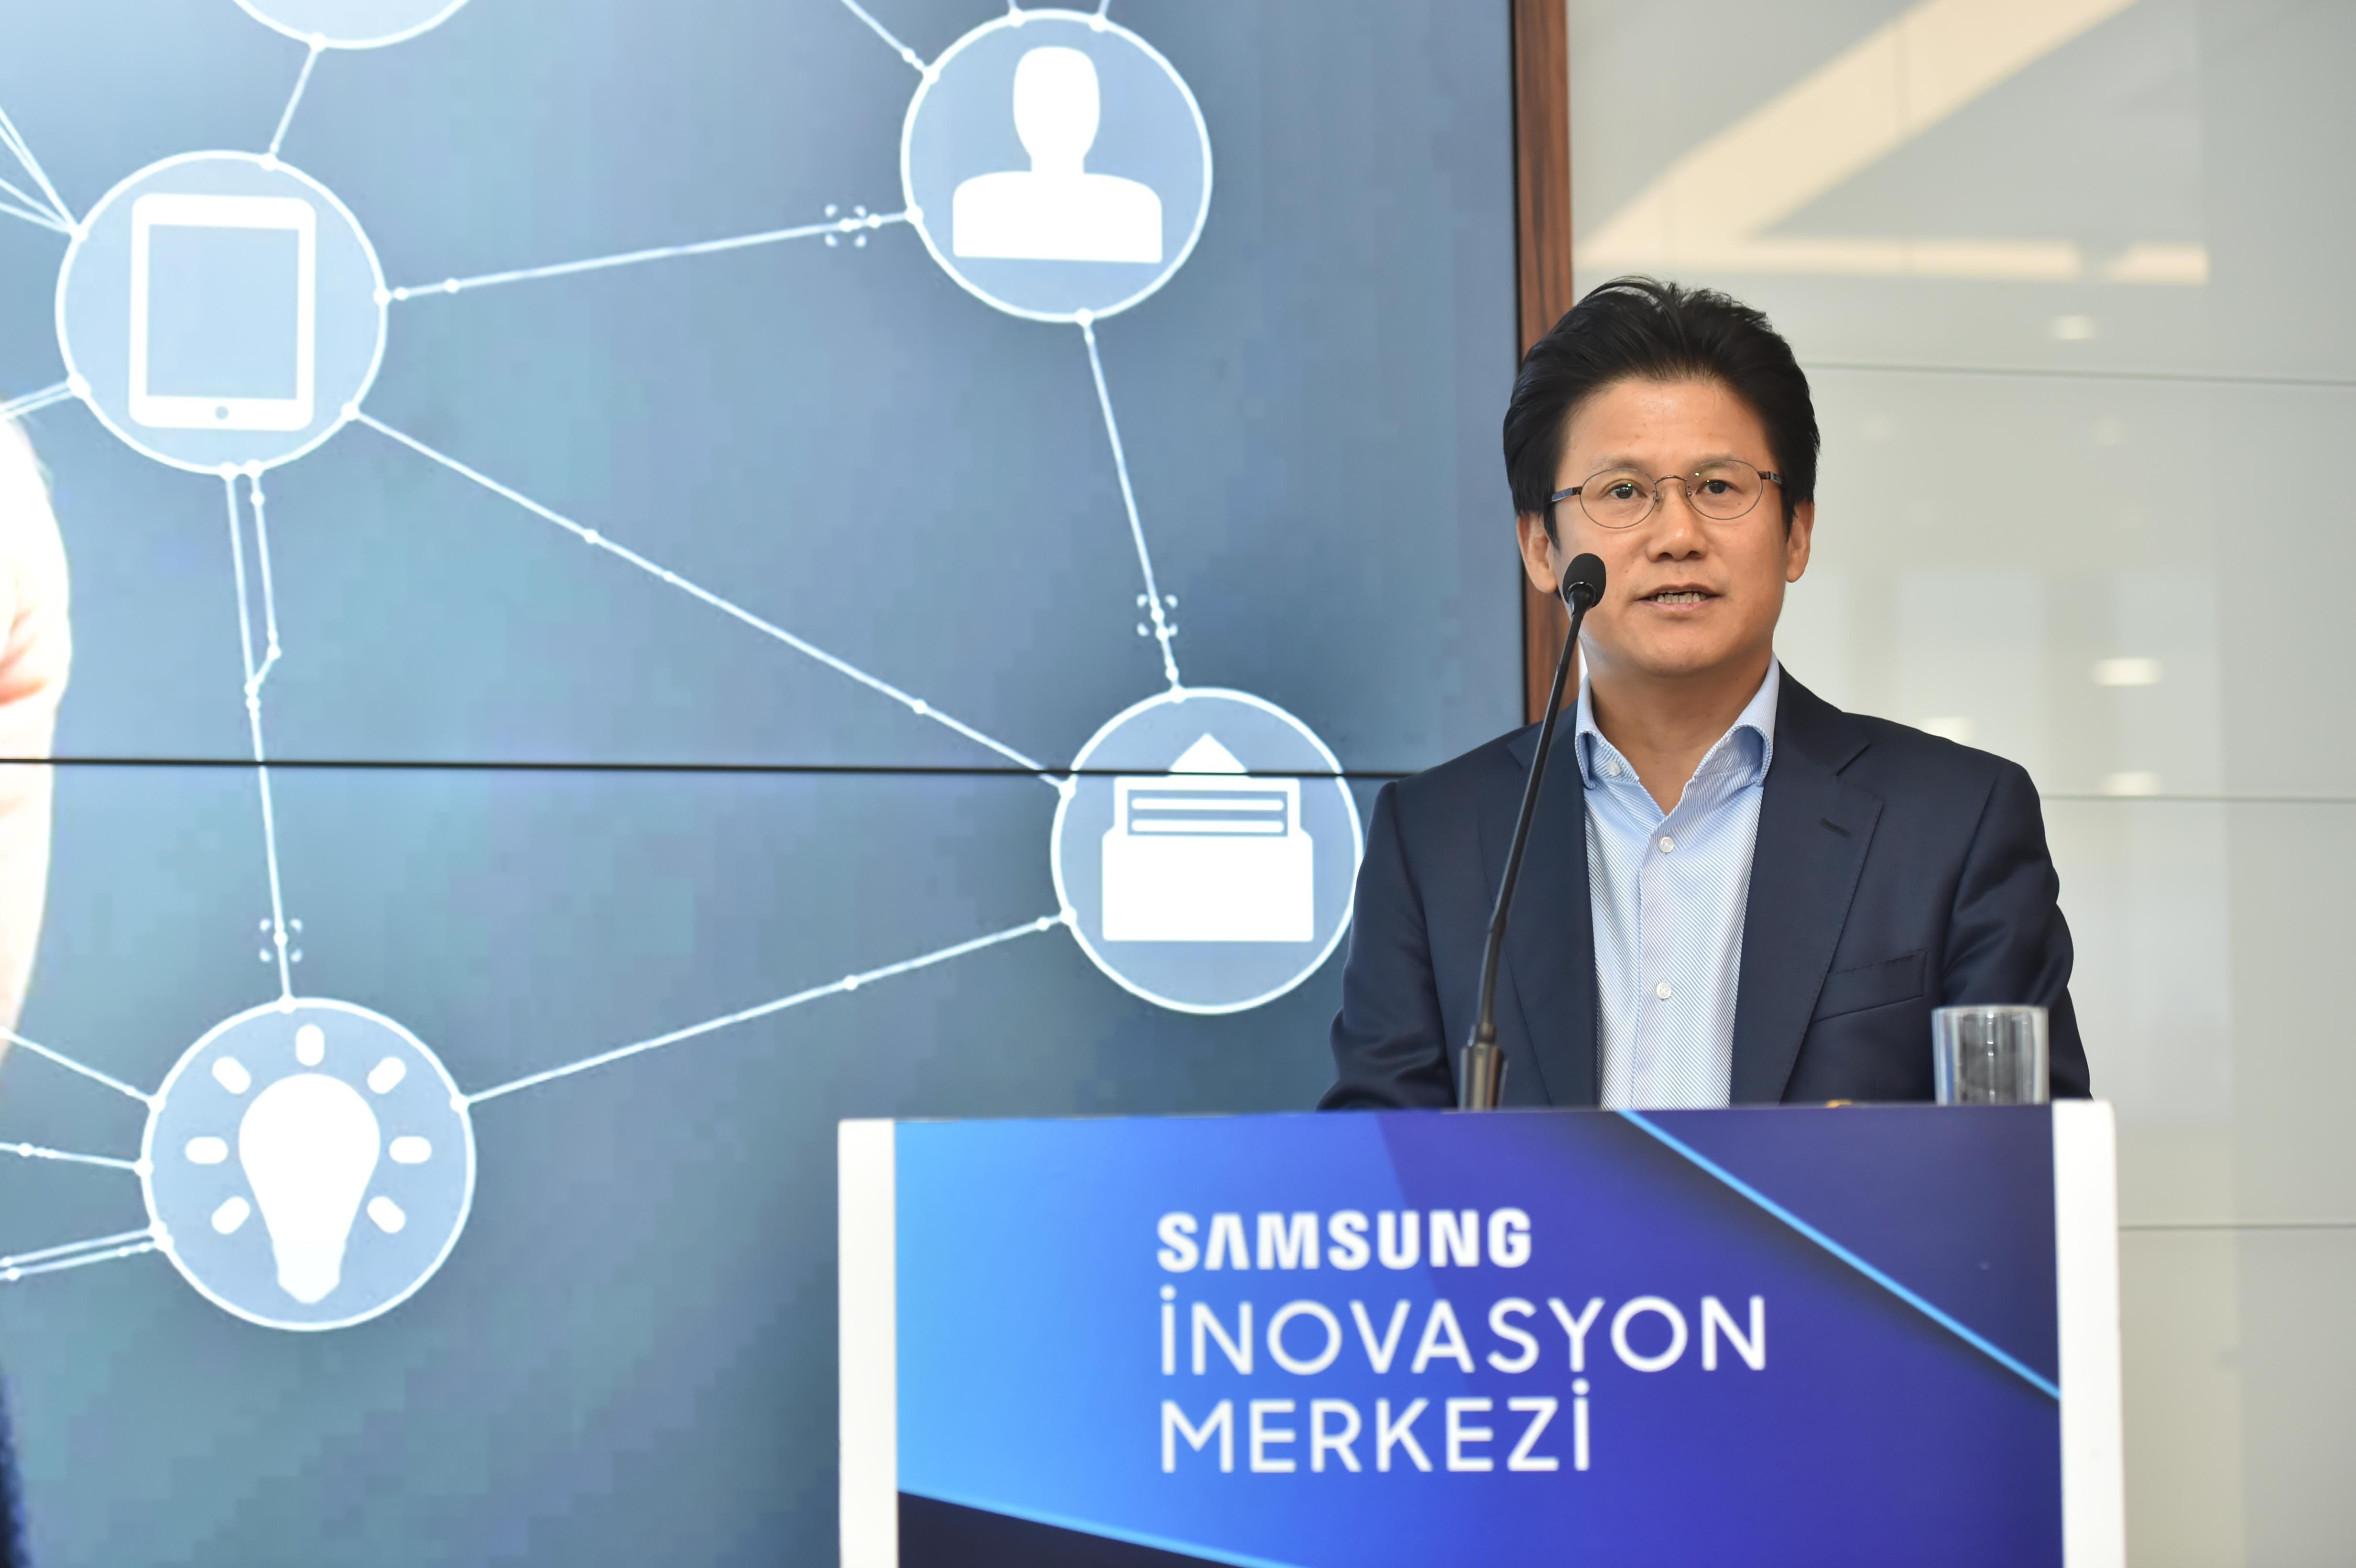 samsung-inovasyon-merkezi-daehyun-kim